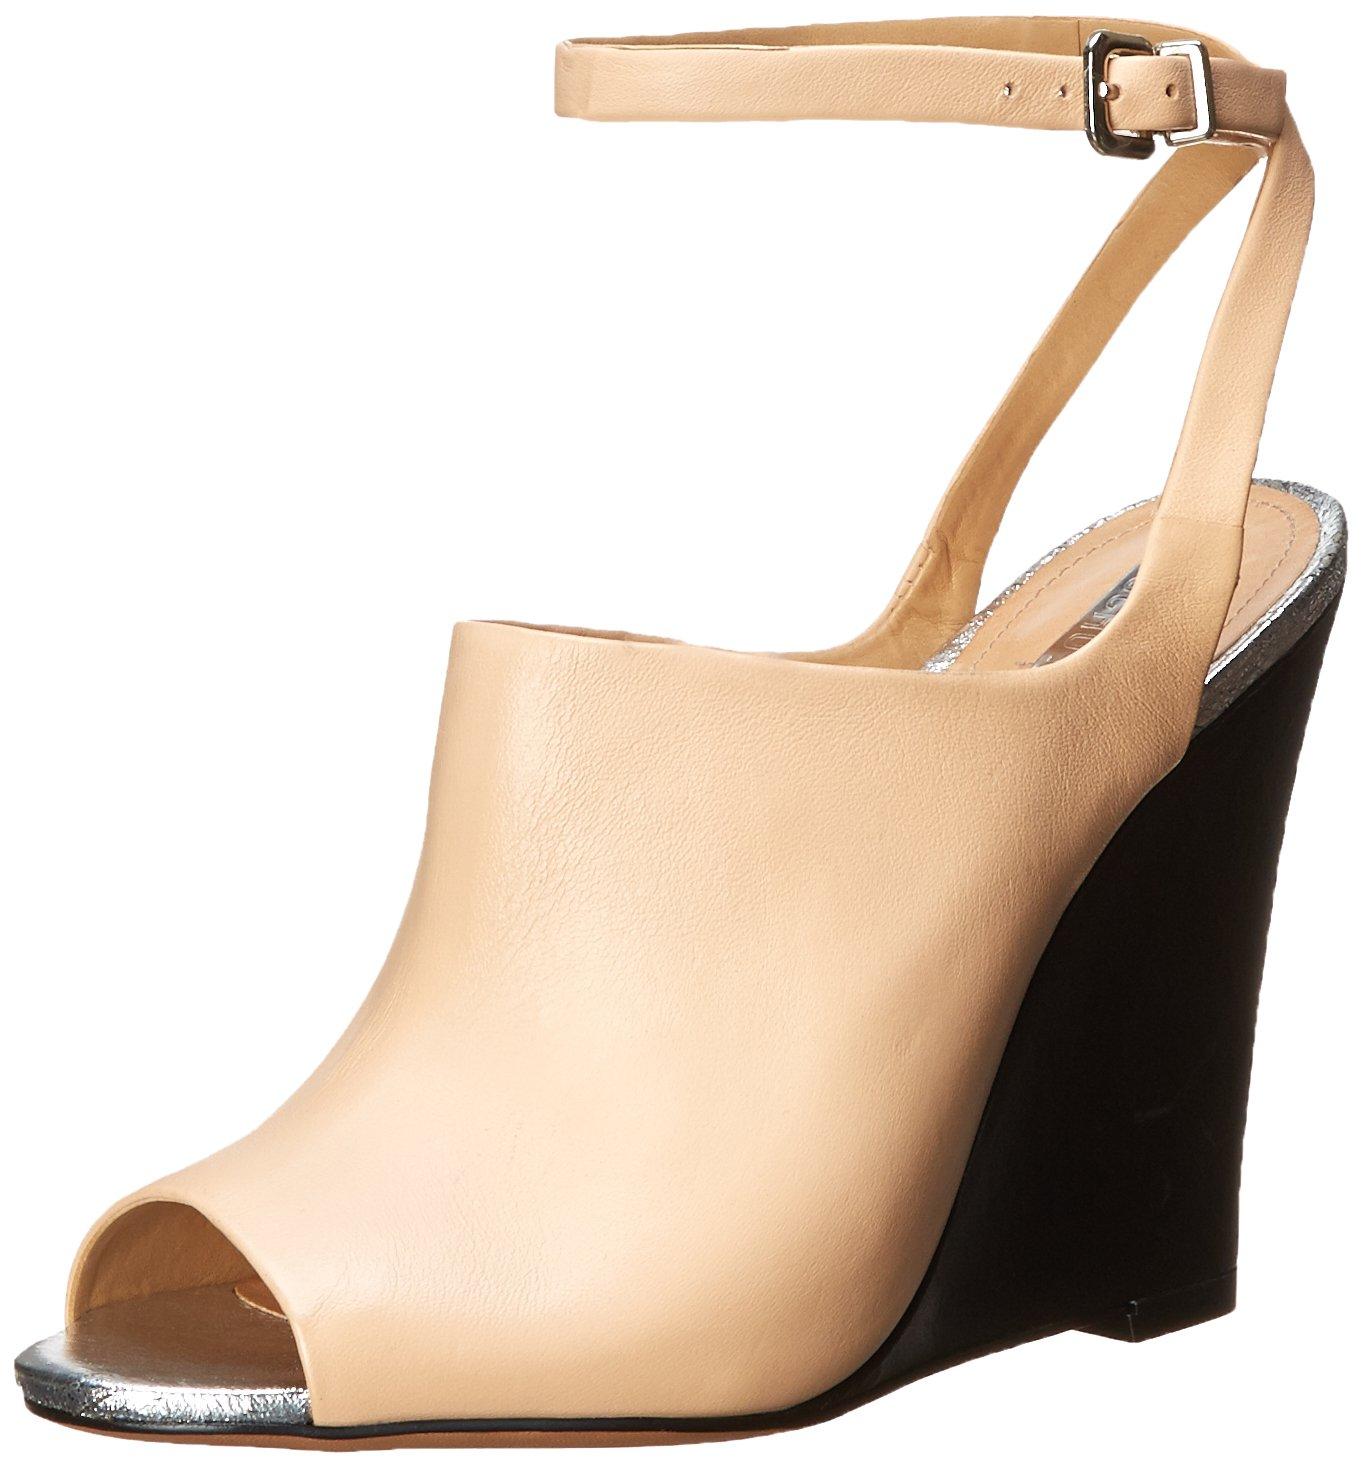 SCHUTZ Women's Clauvania Wedge Sandal B00PW2OEX0 7.5 B(M) US|Beach Sand